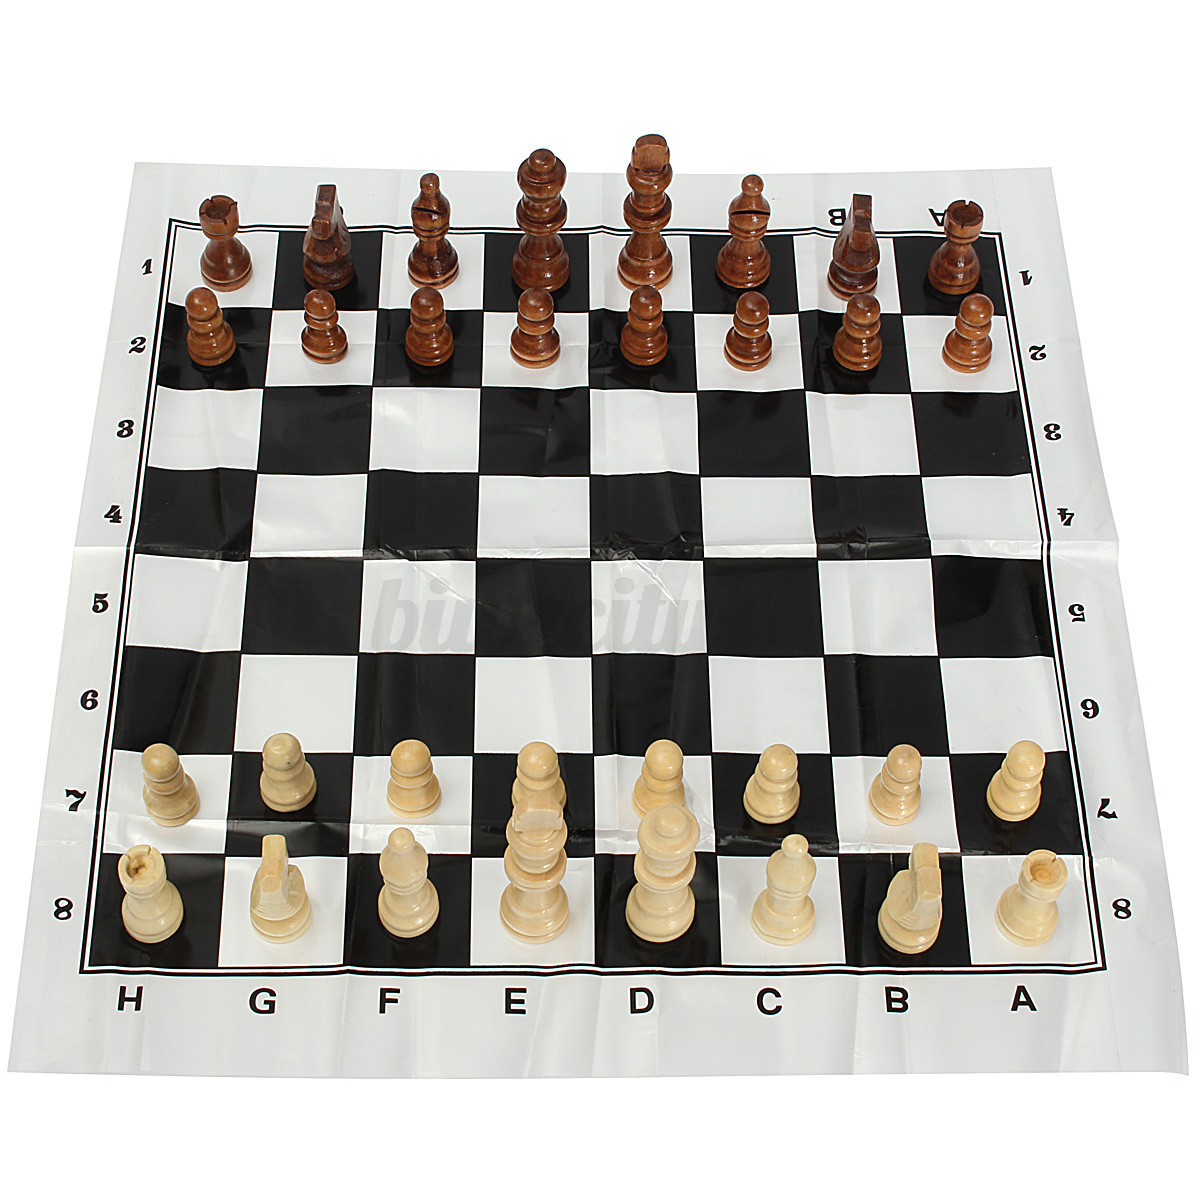 32tlg schachfiguren schach schachspiel holz chess board. Black Bedroom Furniture Sets. Home Design Ideas